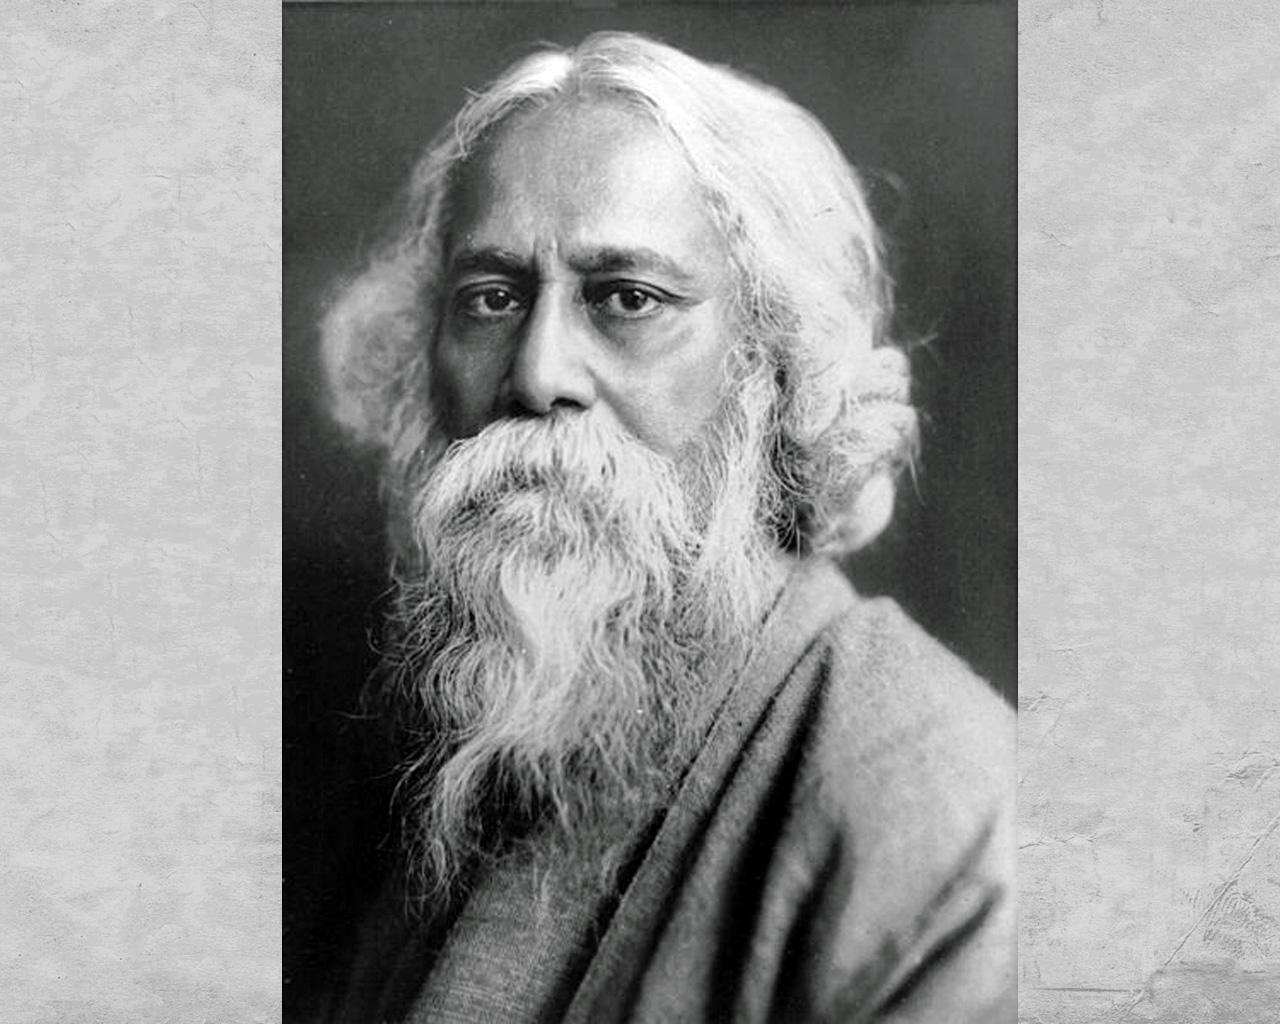 Awards and prizes won by rabindranath tagore biography